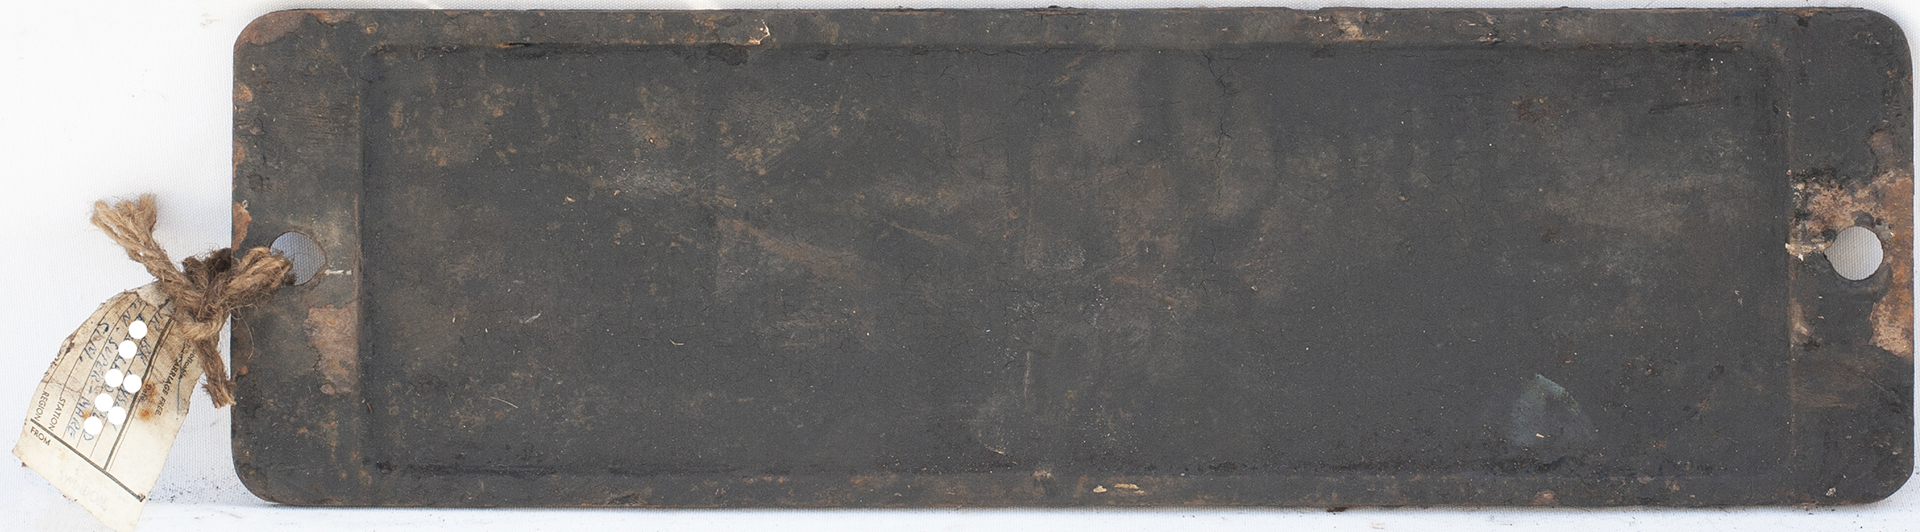 Smokebox Numberplate 6008 Ex Collett King Class